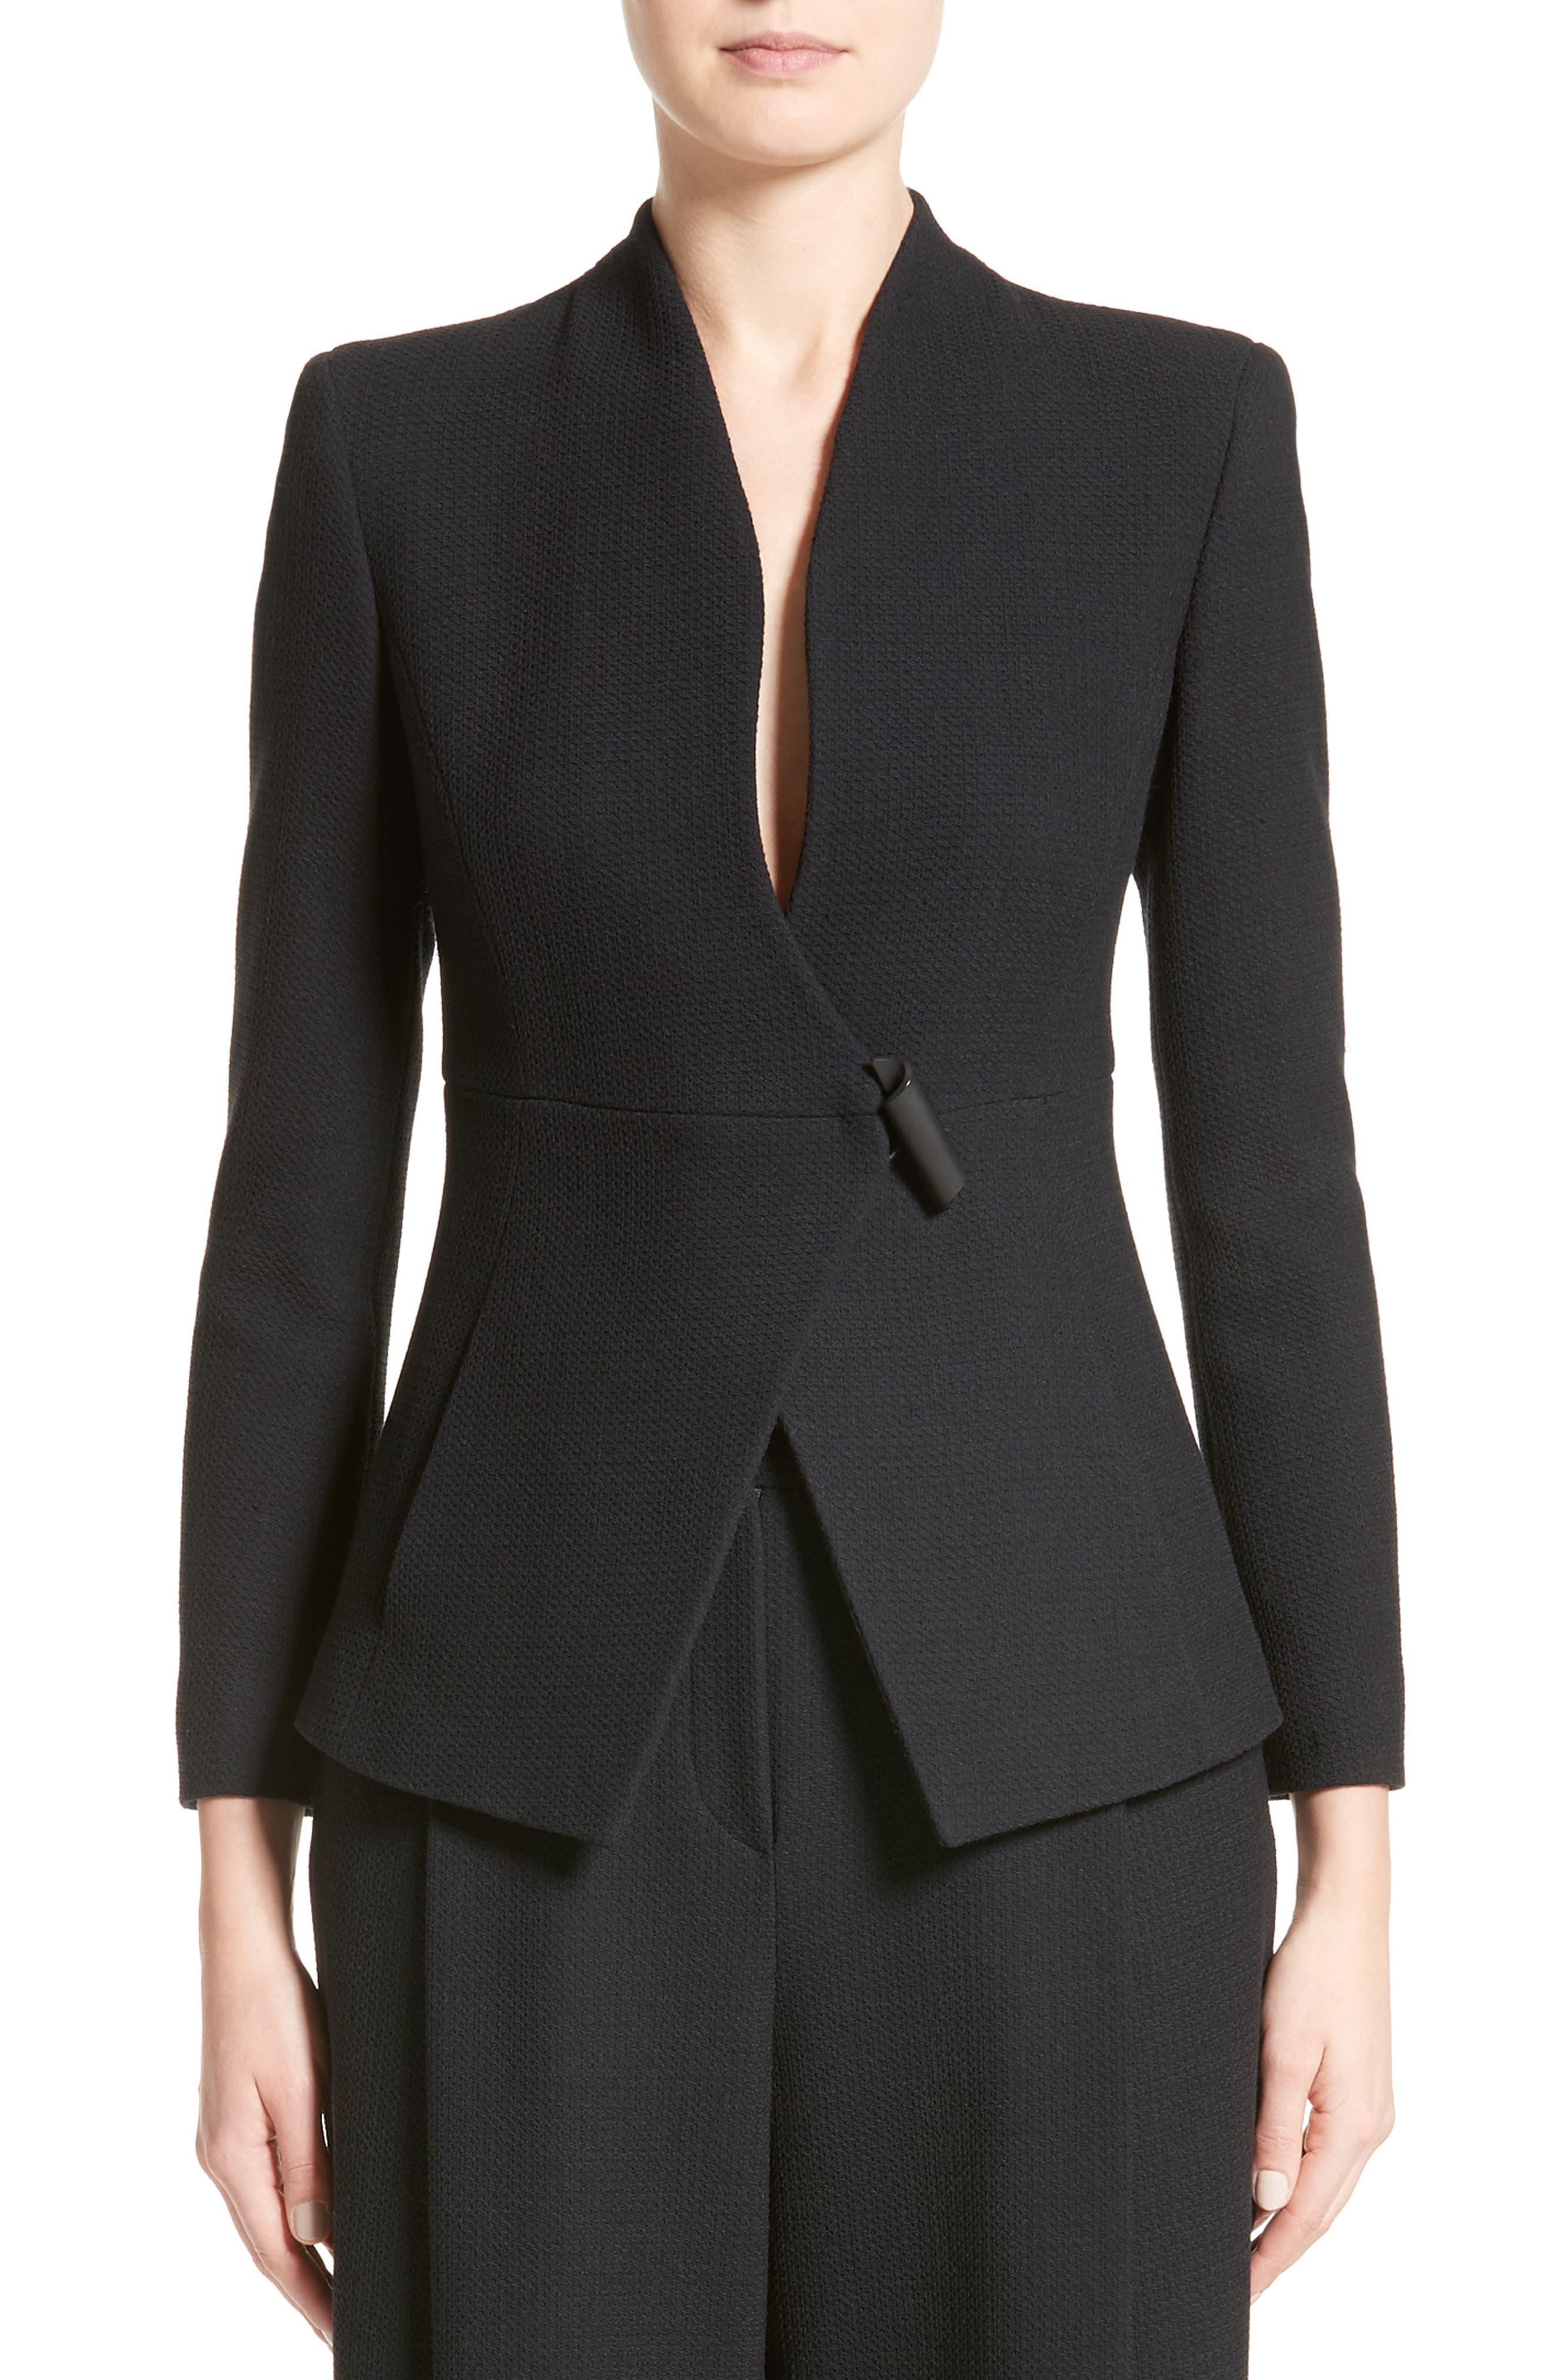 Armani Collezioni Textured Stretch Wool Jacket